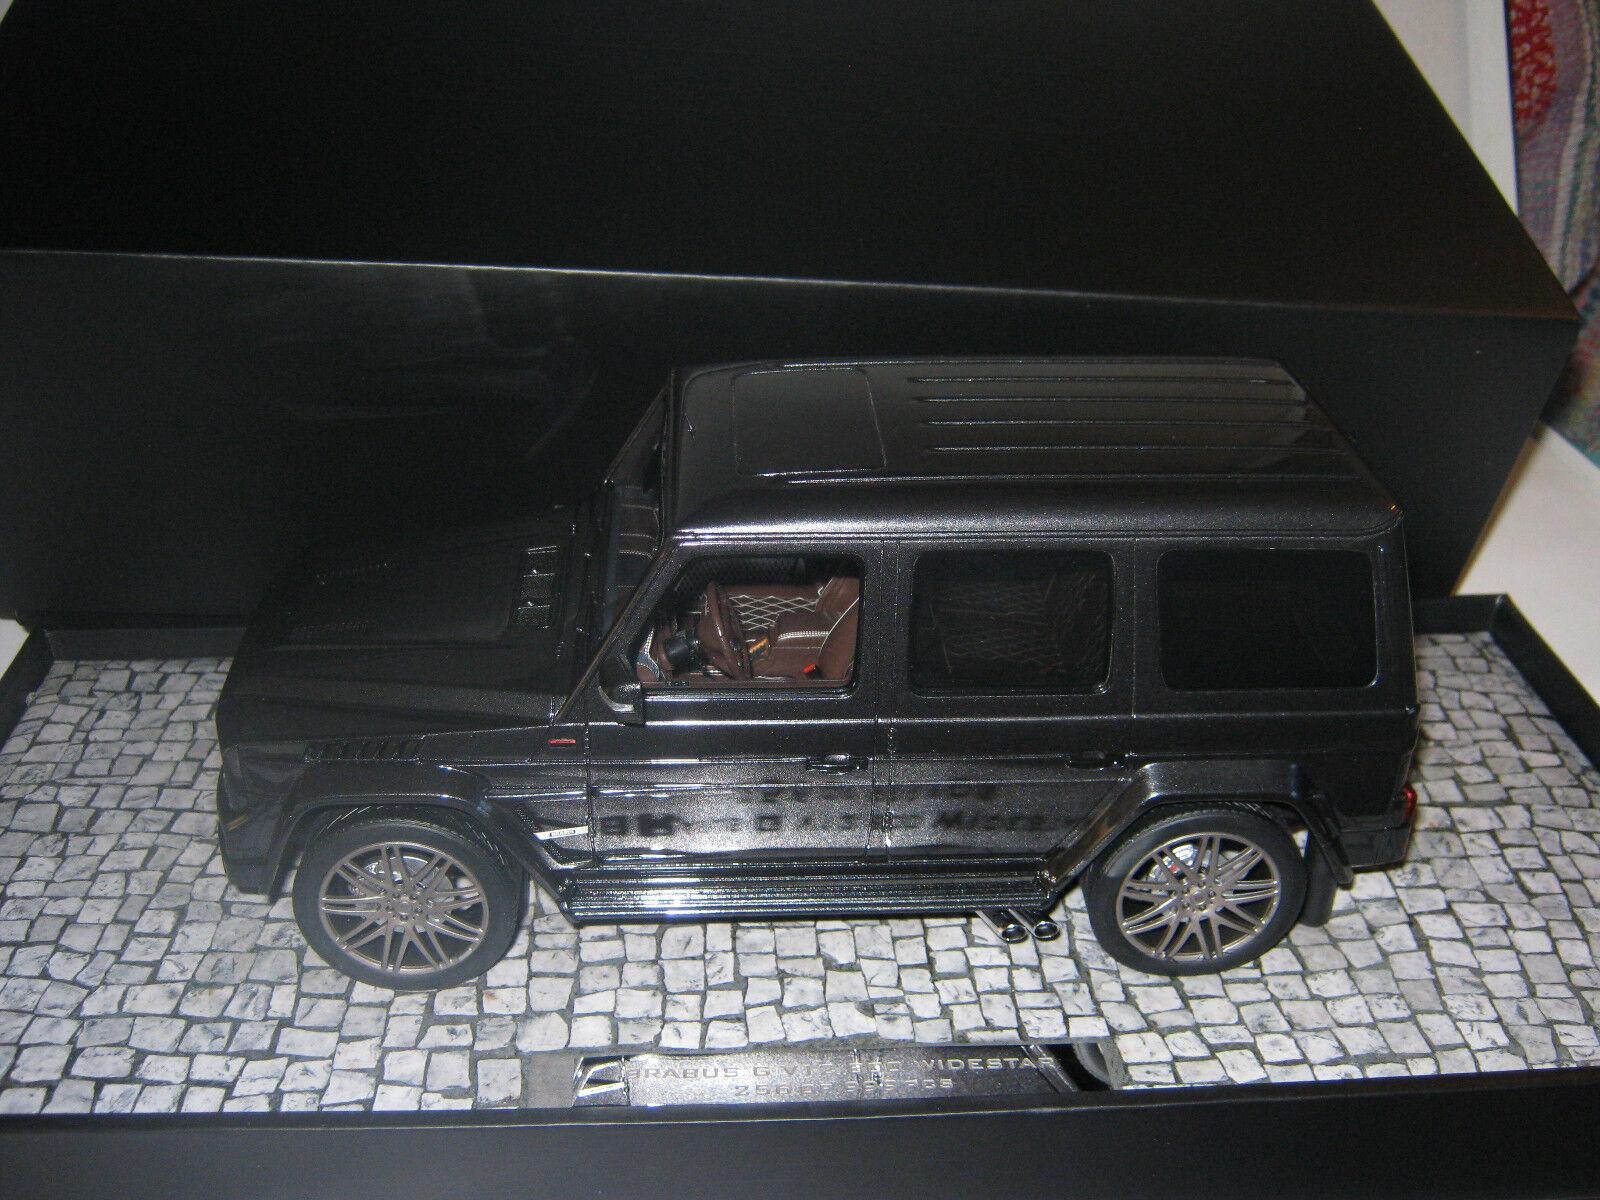 1 18 Brabus G v12 800 Widestar gris Minichamps 107032300 neuf dans sa boîte NEUF